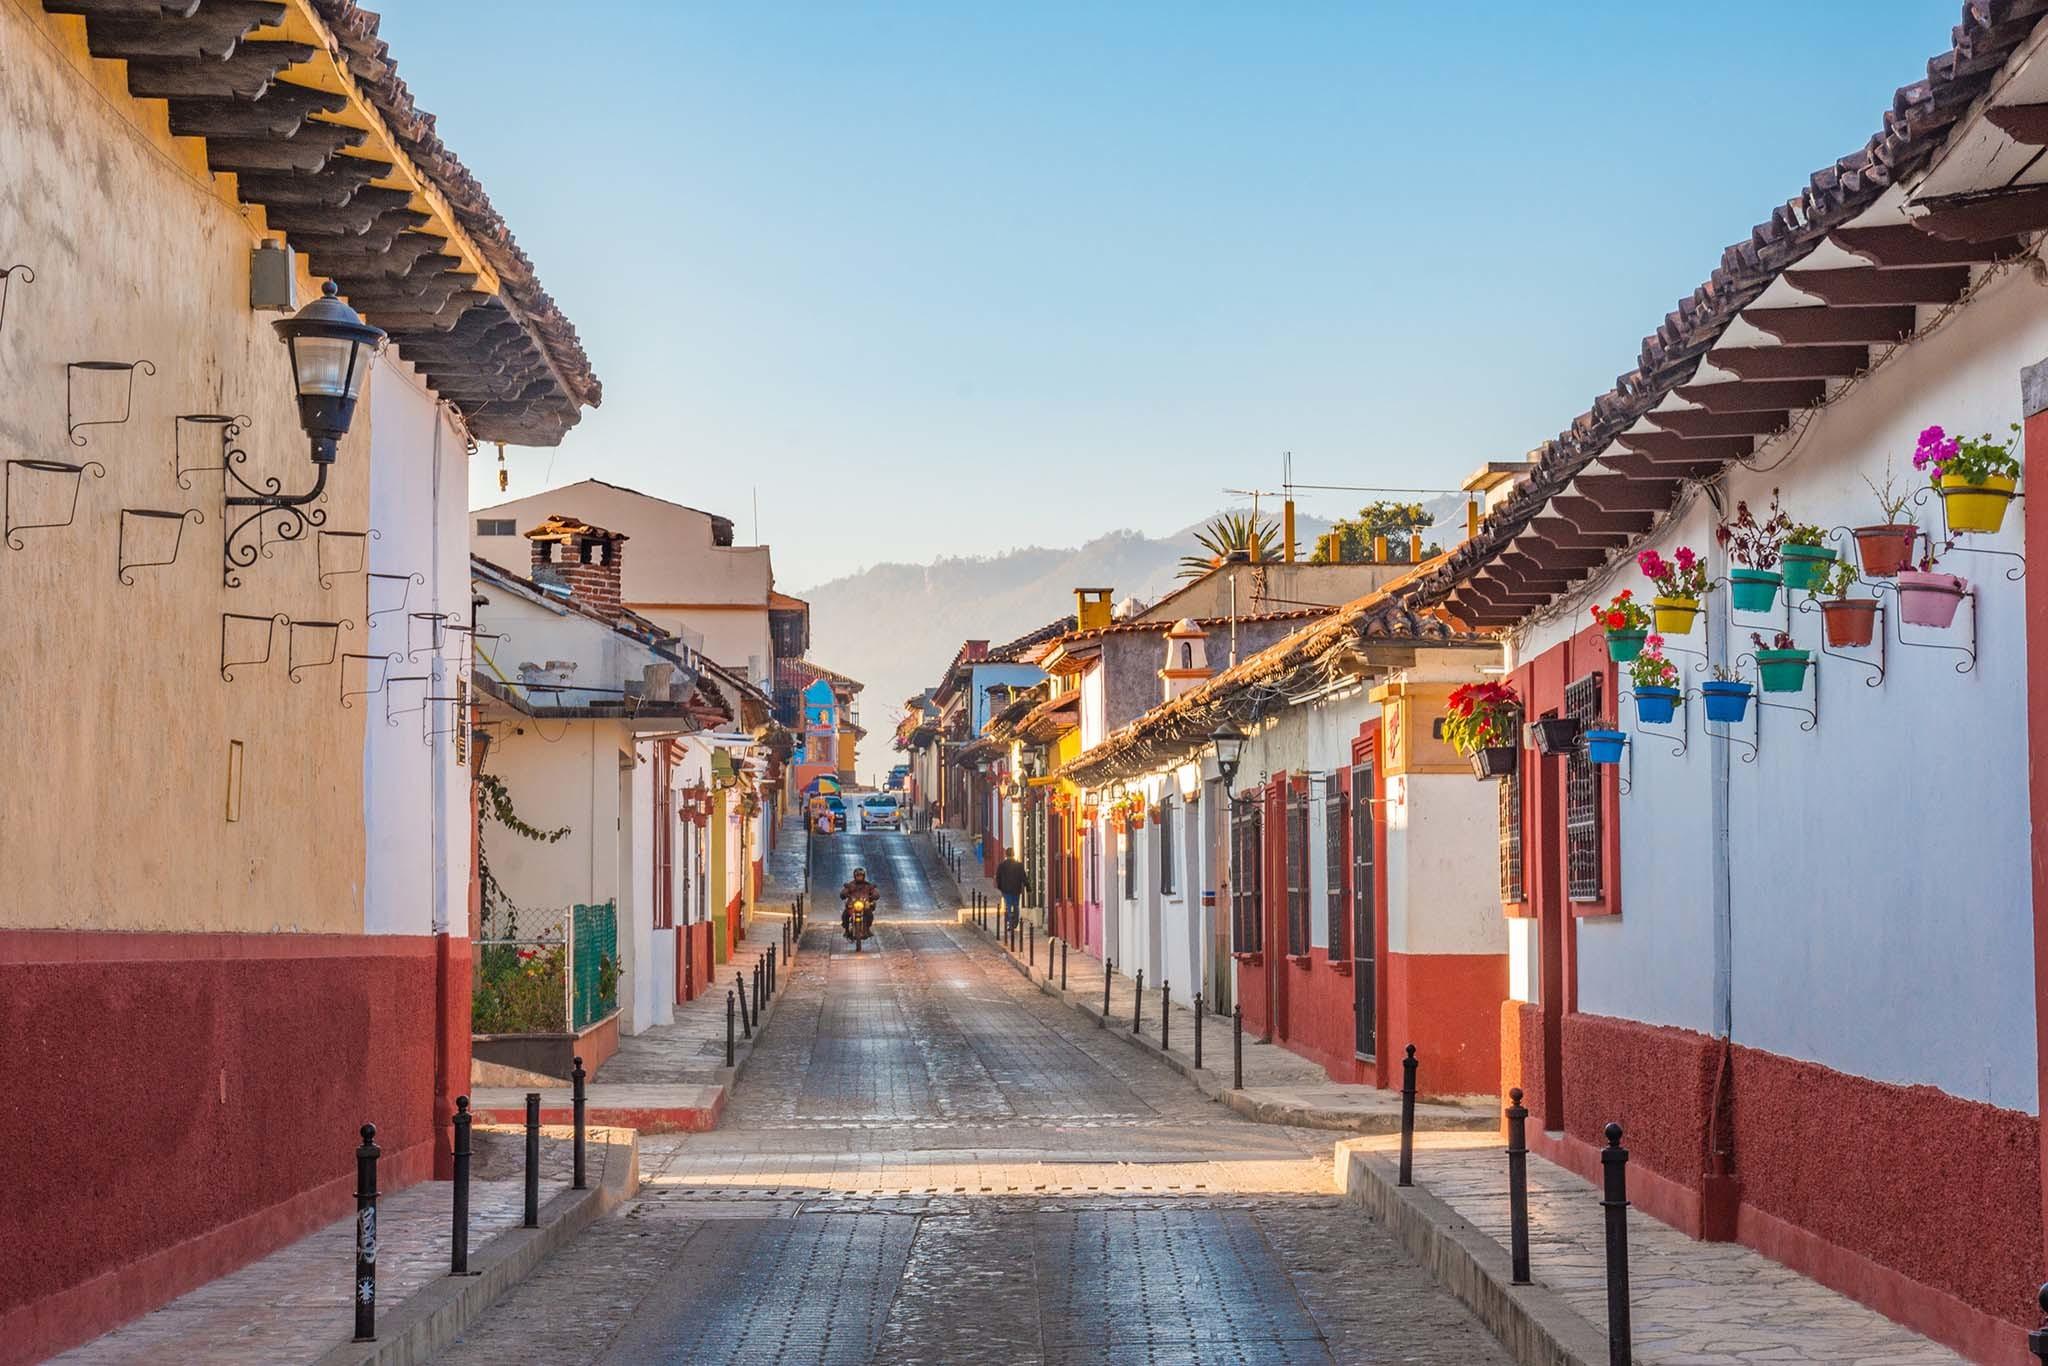 Street in San Cristóbal de las Casas, Chiapas, Mexico